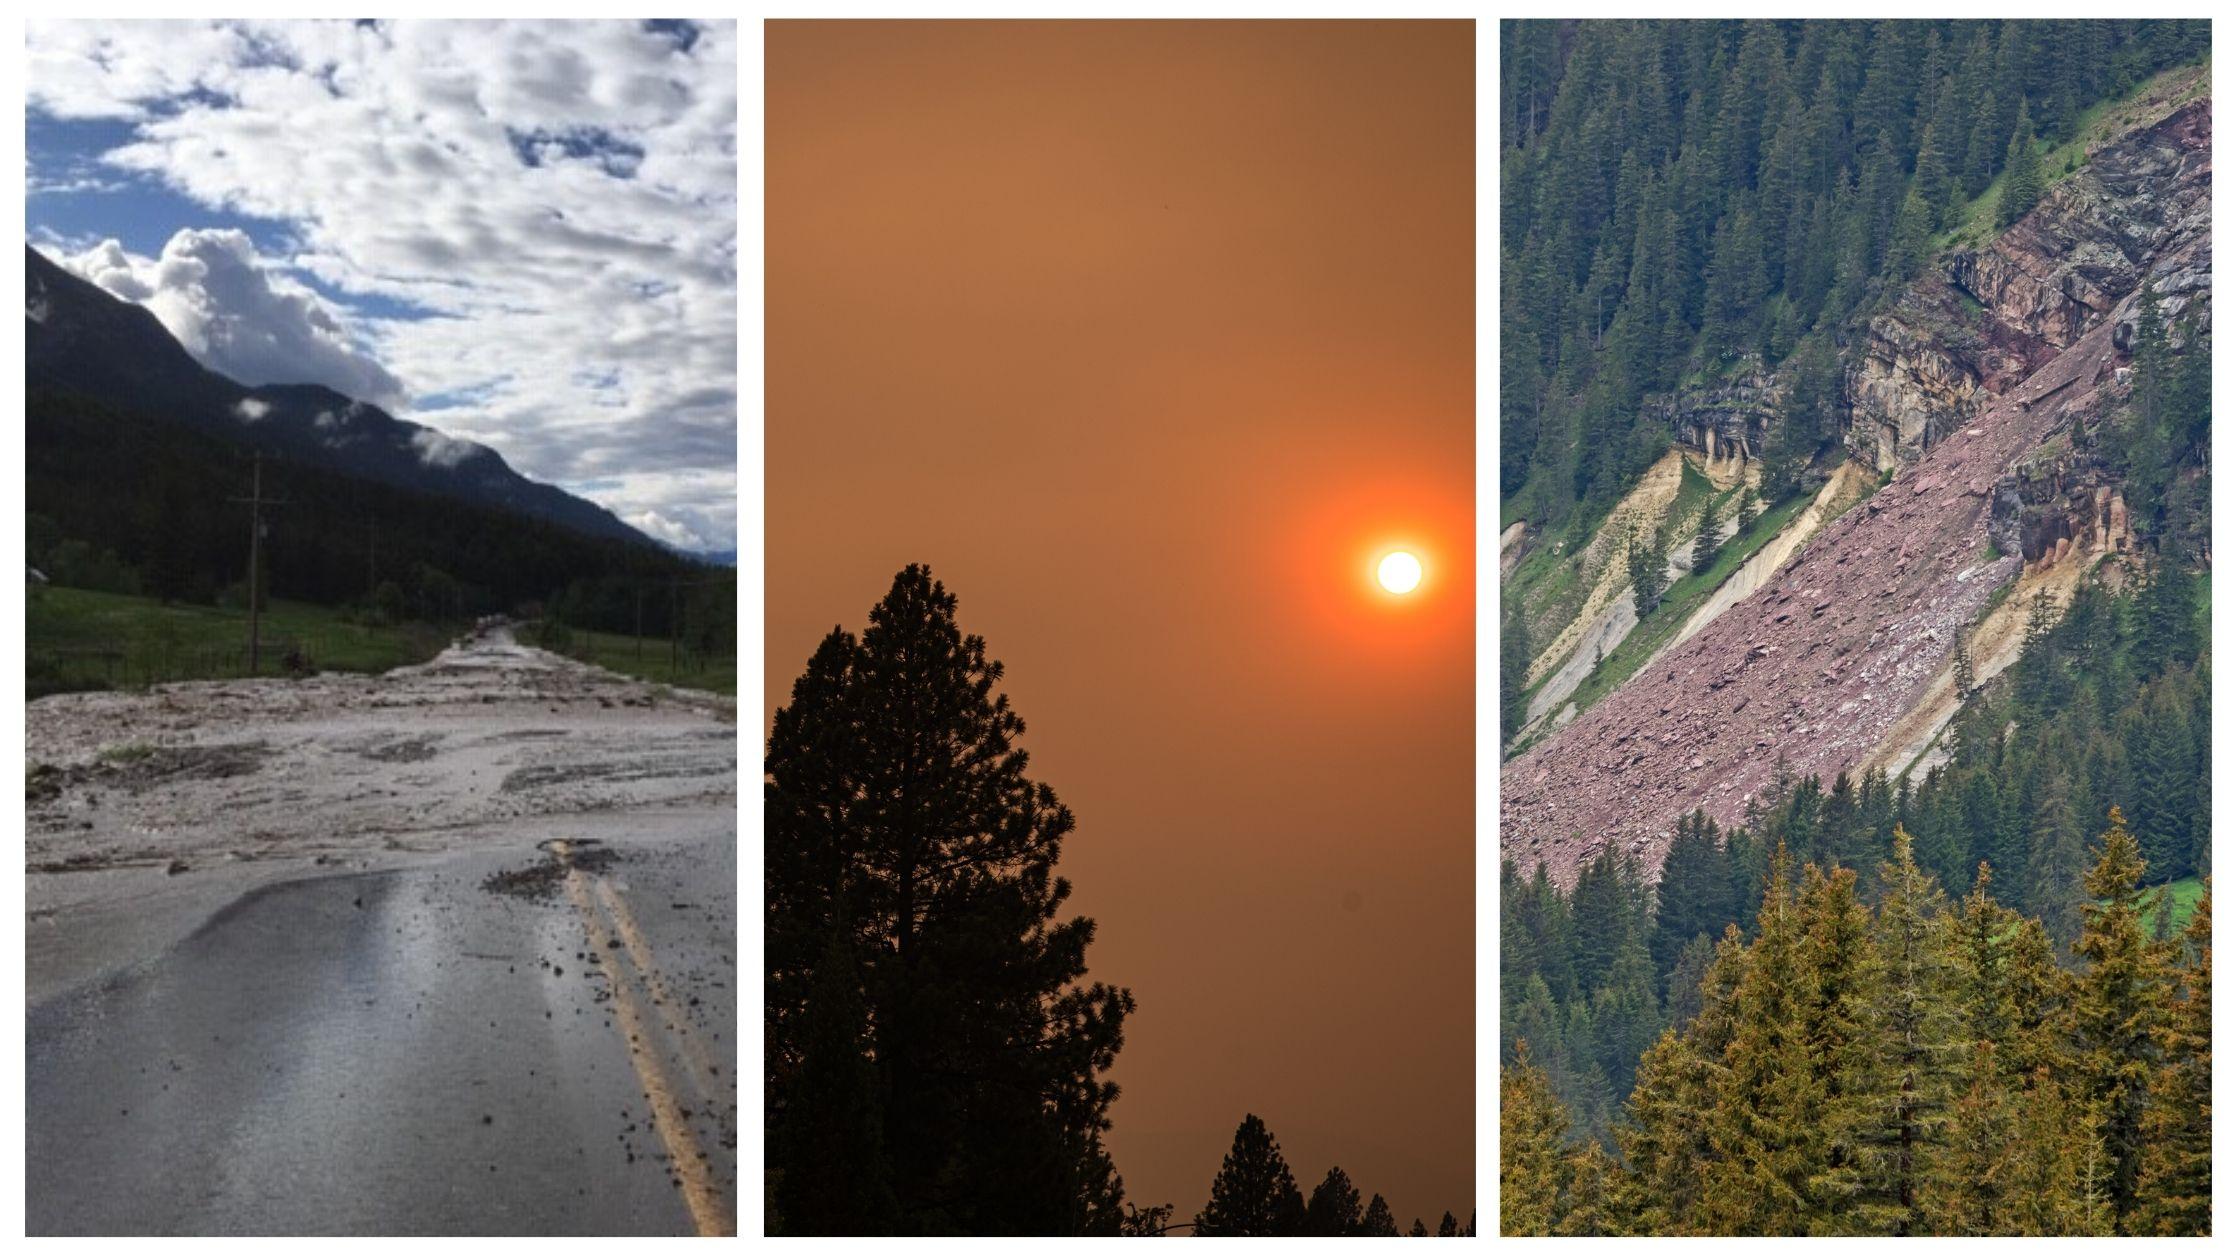 Flooding, wildfire smoke and landslide